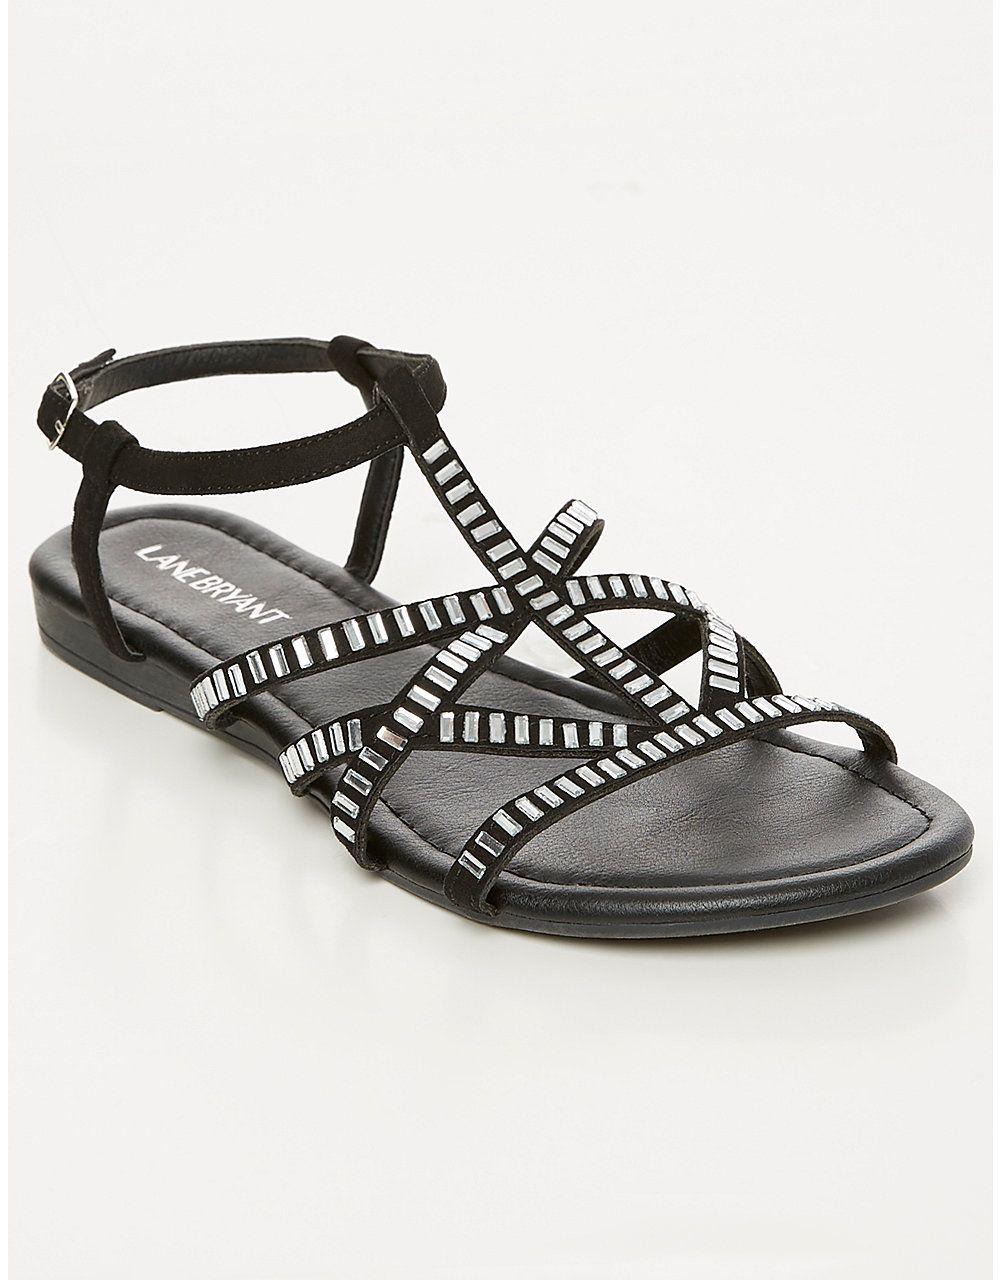 4743be758ec Bling Flat Sandal